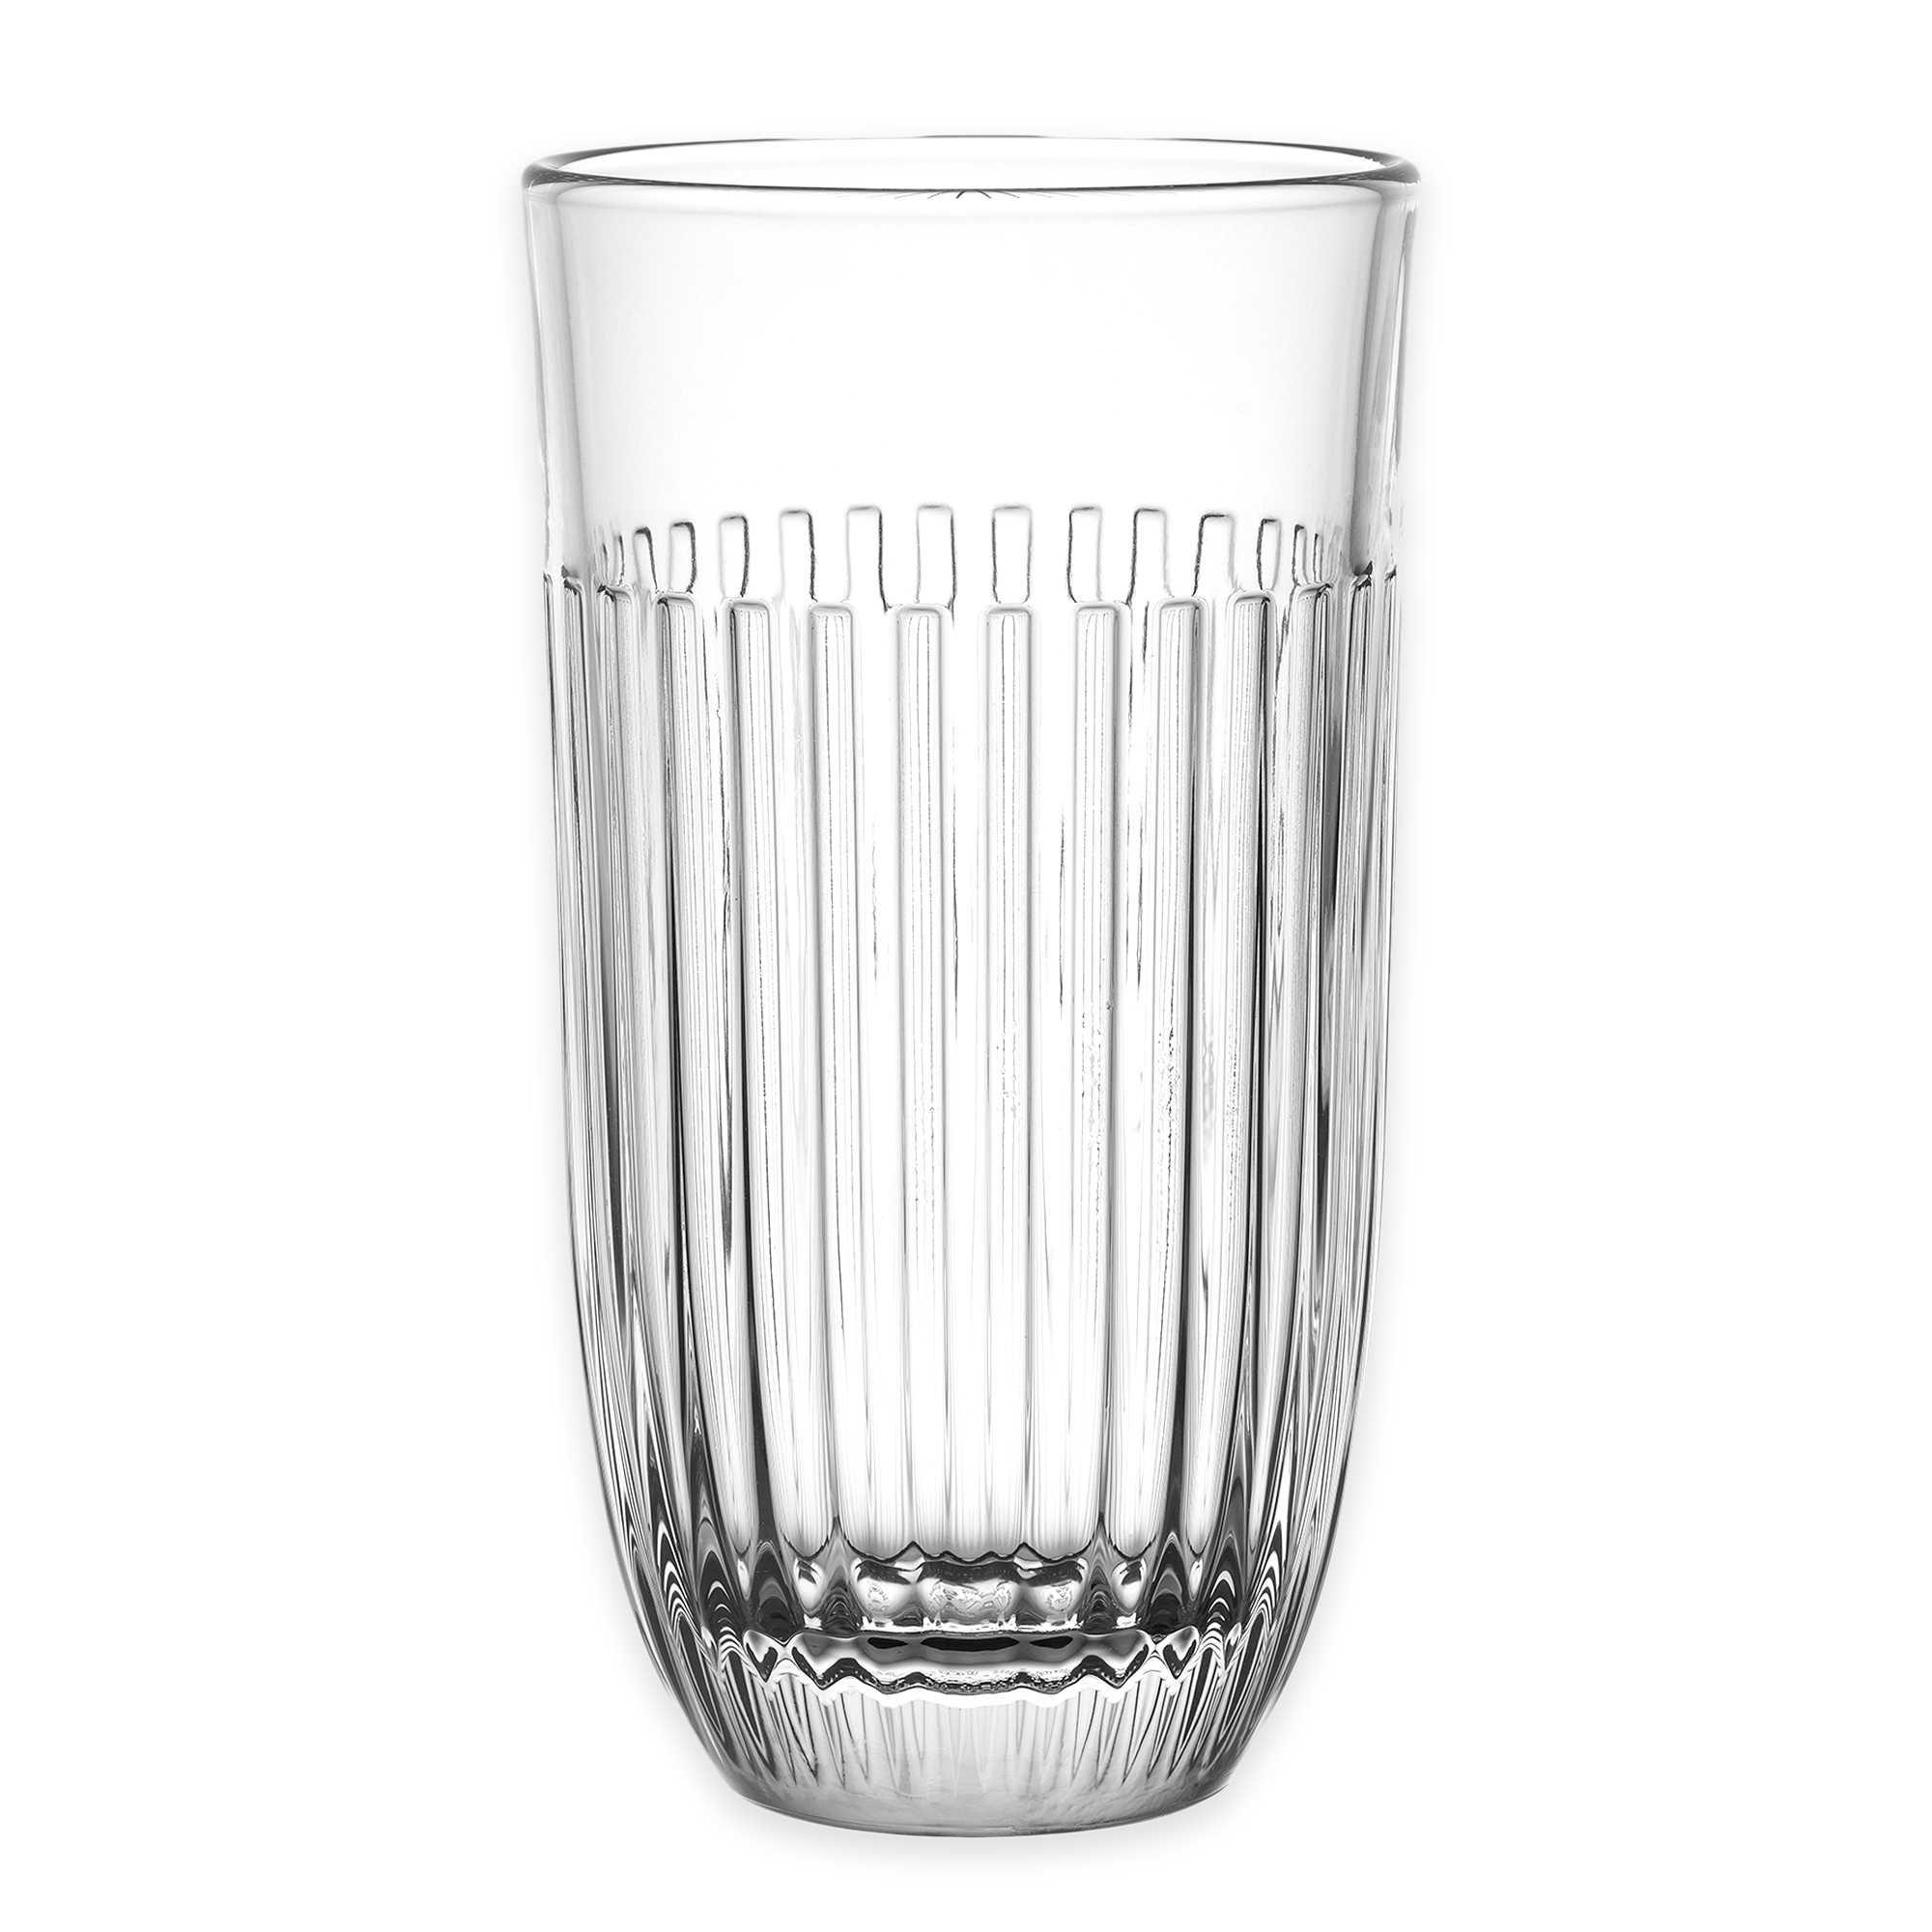 La Rochere Ouessant Iced Tea Glasses (Set of 6)